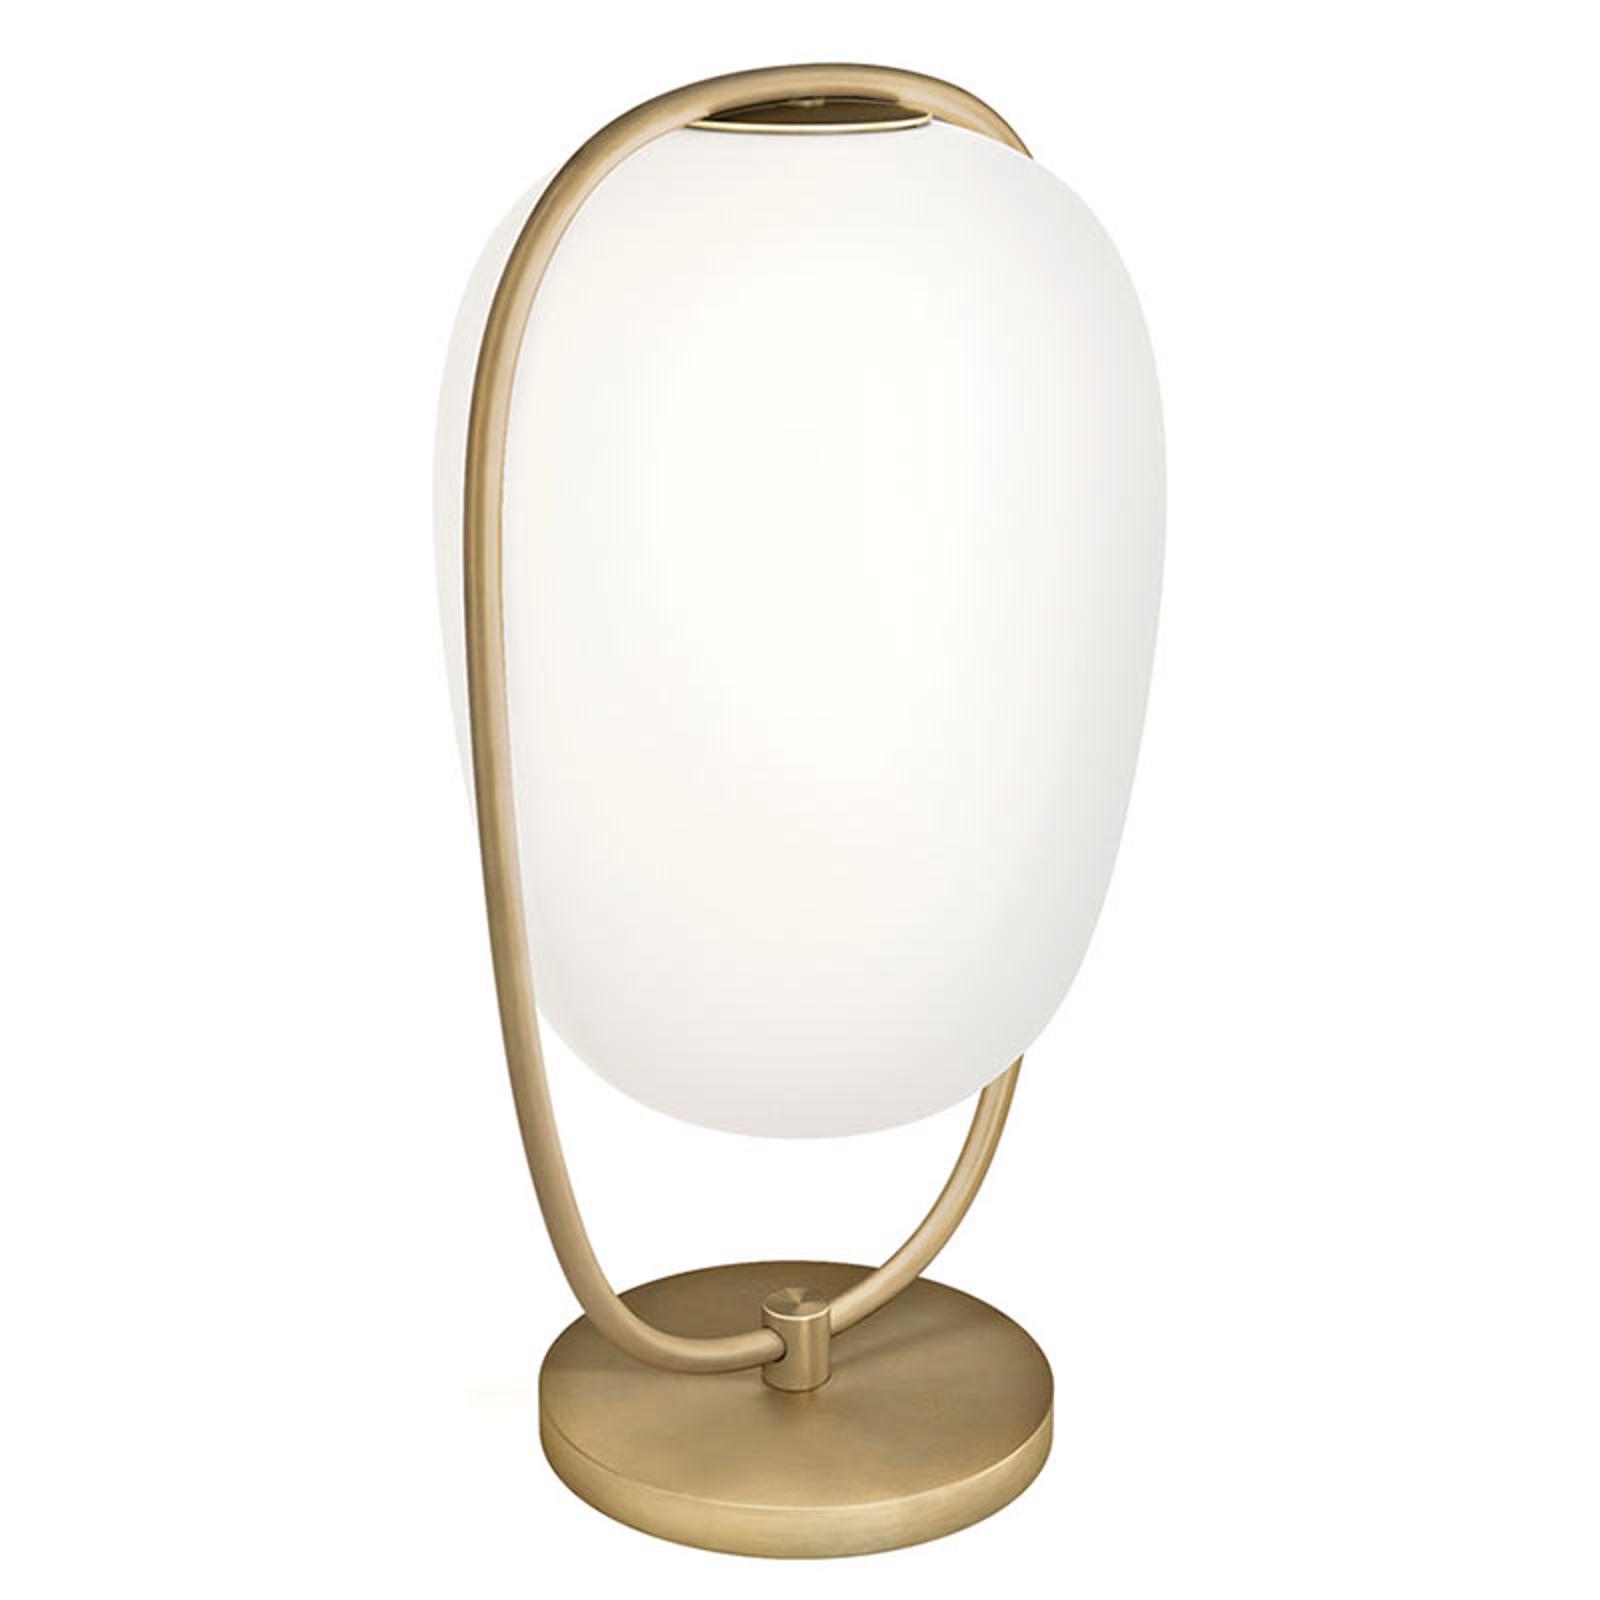 Lampe à poser Kundalini Lanna en verre soufflé